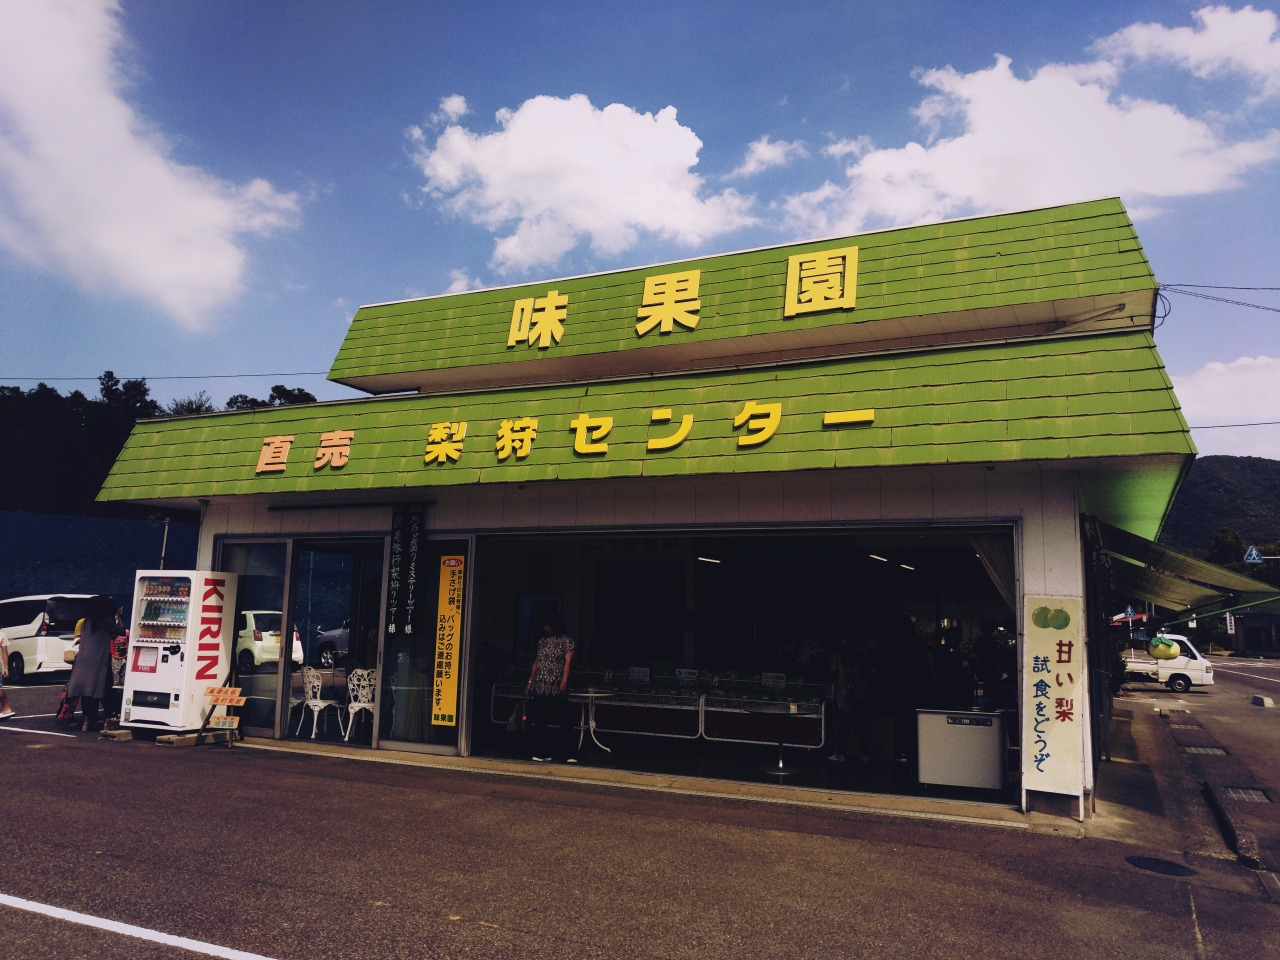 Mikaen